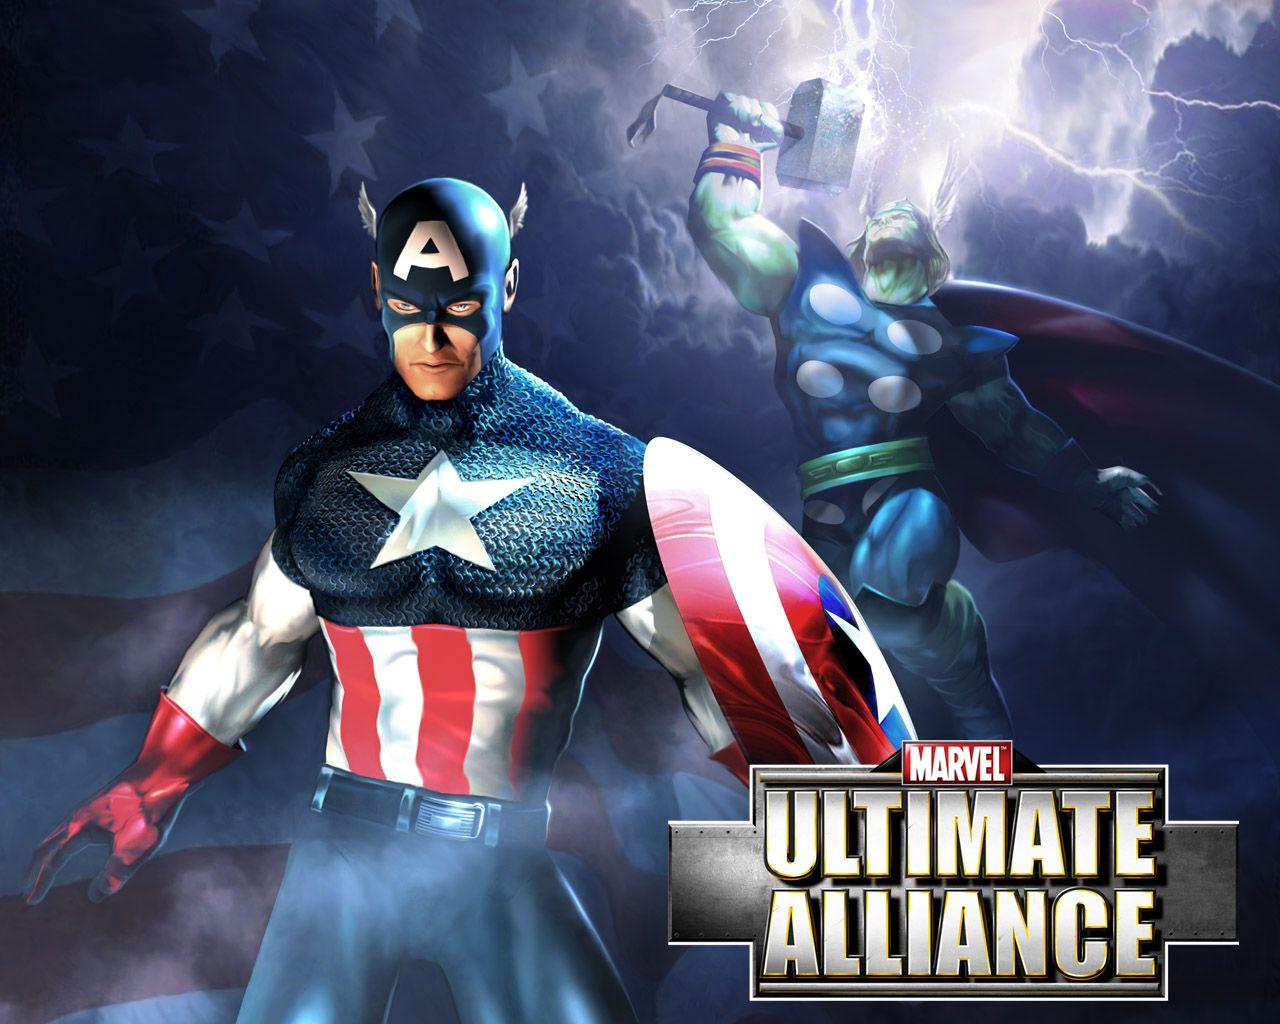 40 Marvelous Comic Superhero Wallpapers